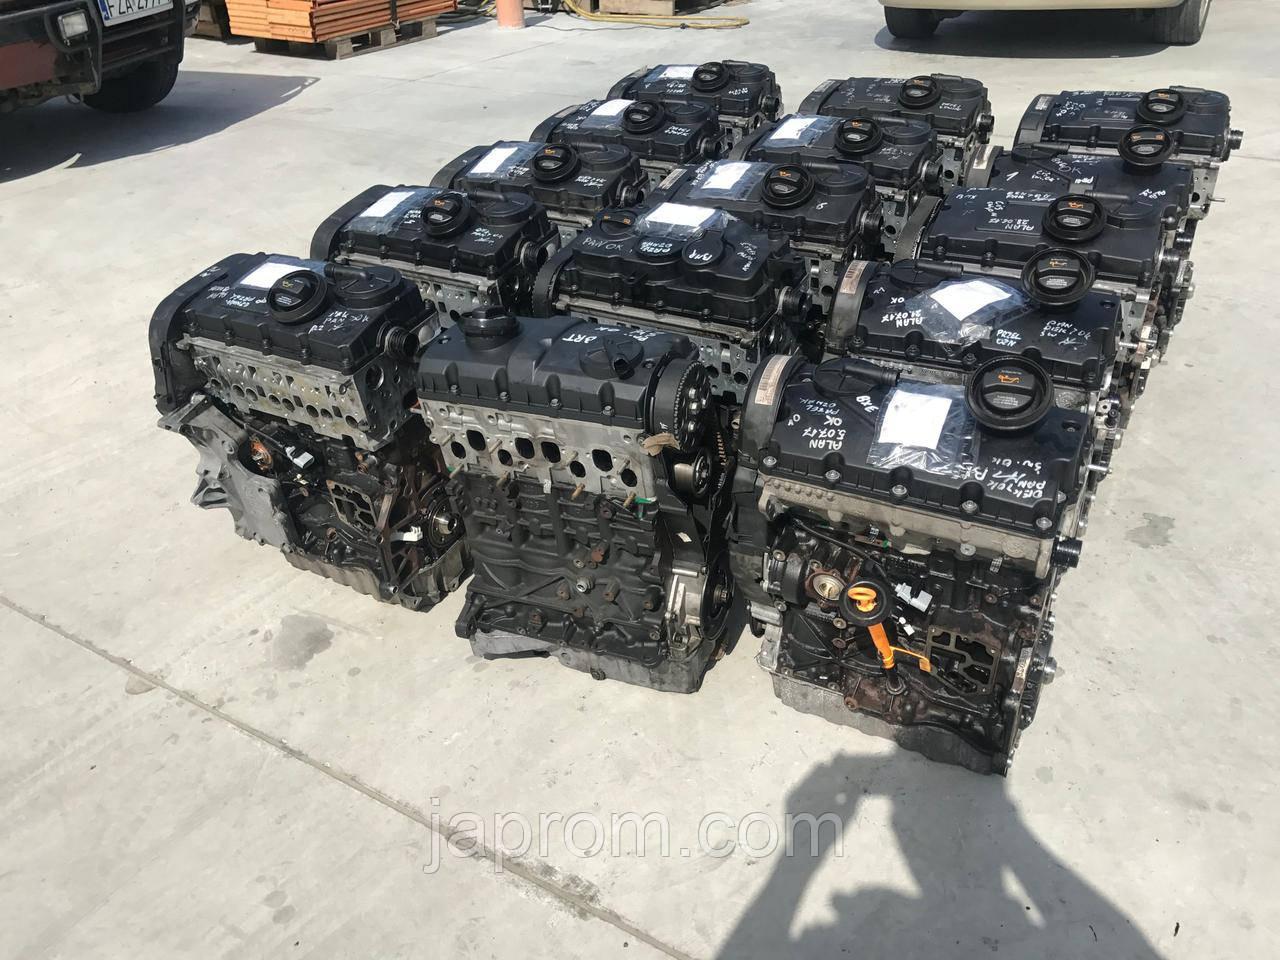 Мотор (Двигатель) Volkswagen Transporter T5 1.9 TDI 80-105 KM AXC,AXB